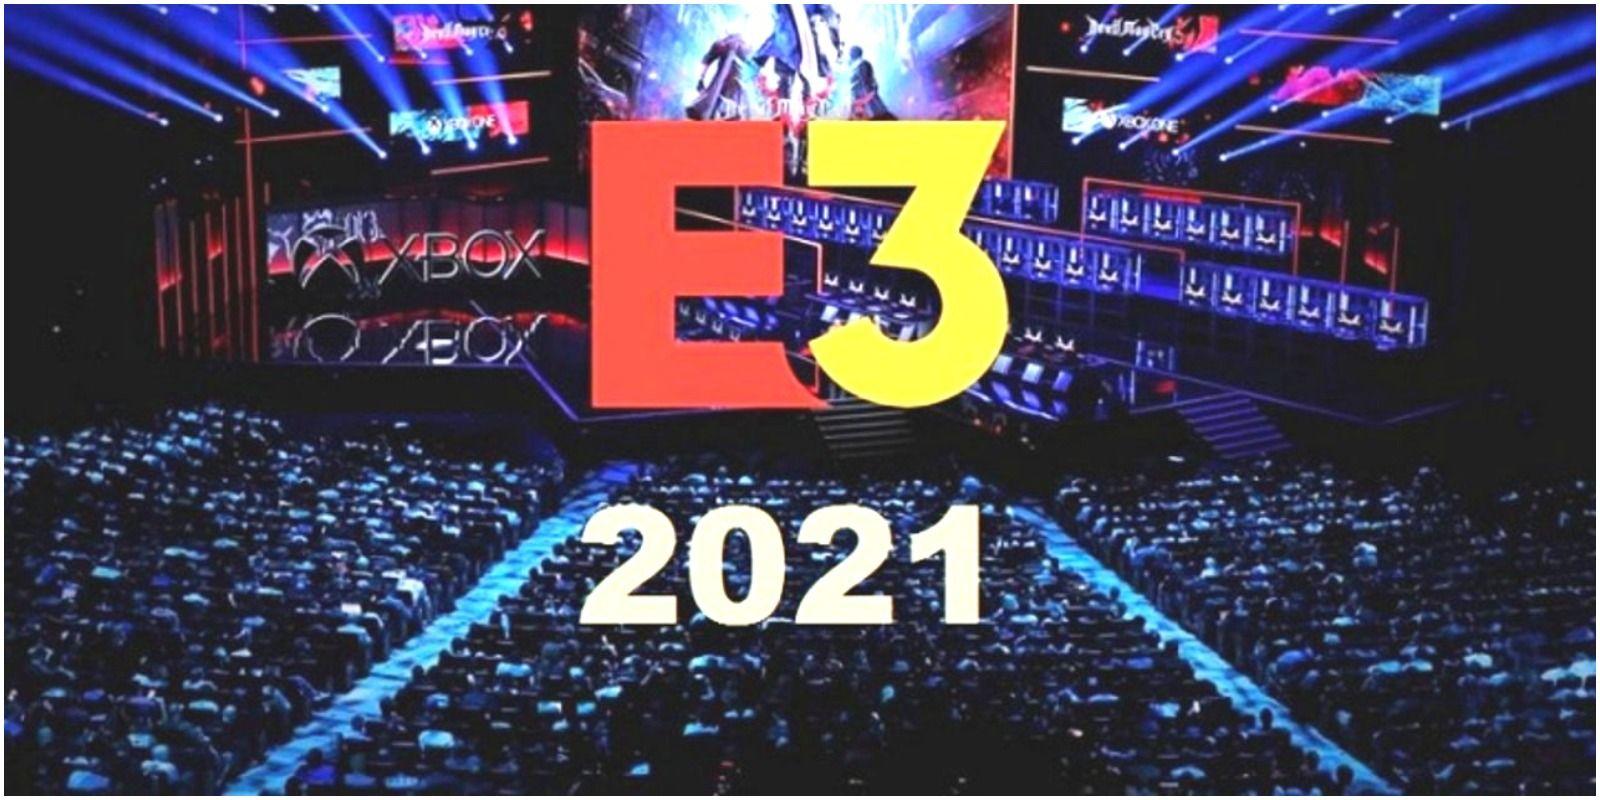 GameStop Reveals Top 10 Pre-Ordered Games After E3 2021 | CBR